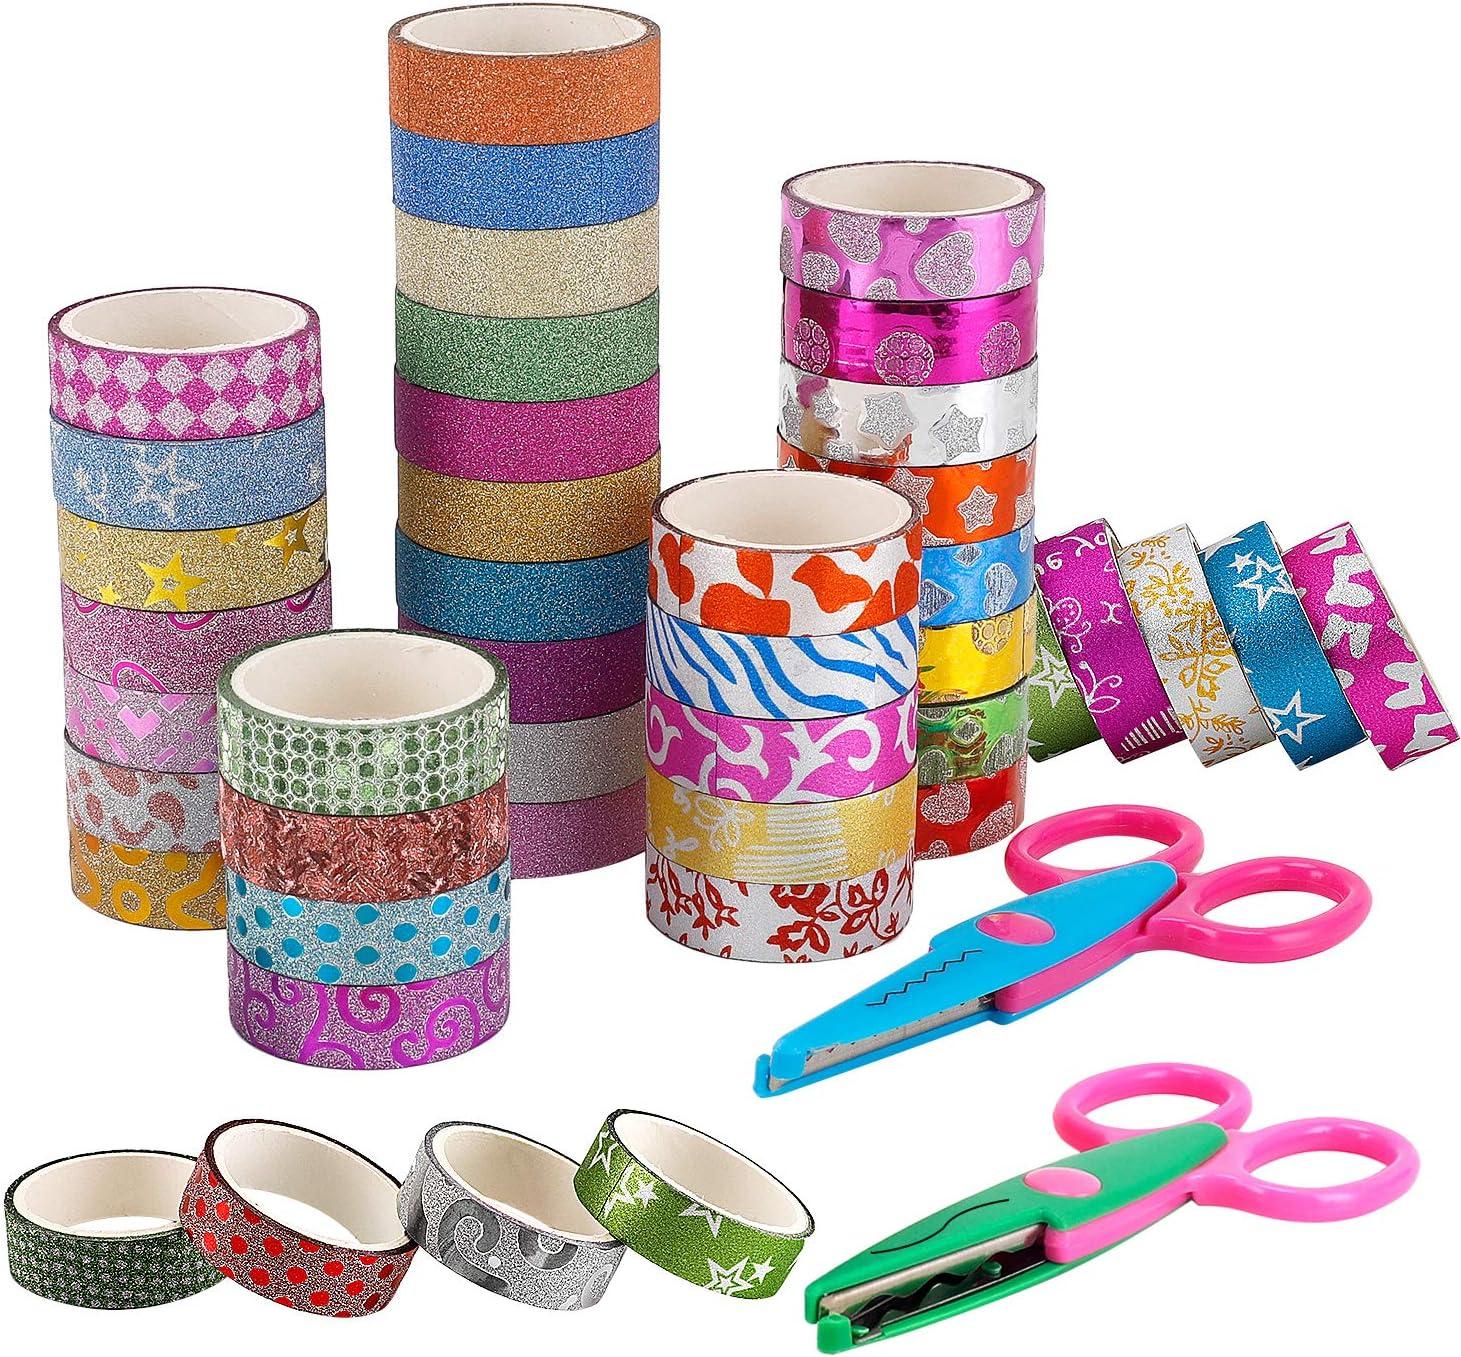 New Glitter Tape Set of 50 Rolls 2 Craft Scissors- Decorative Washi Tape Perfect for DIY Crafts Book Designs Scrapbook